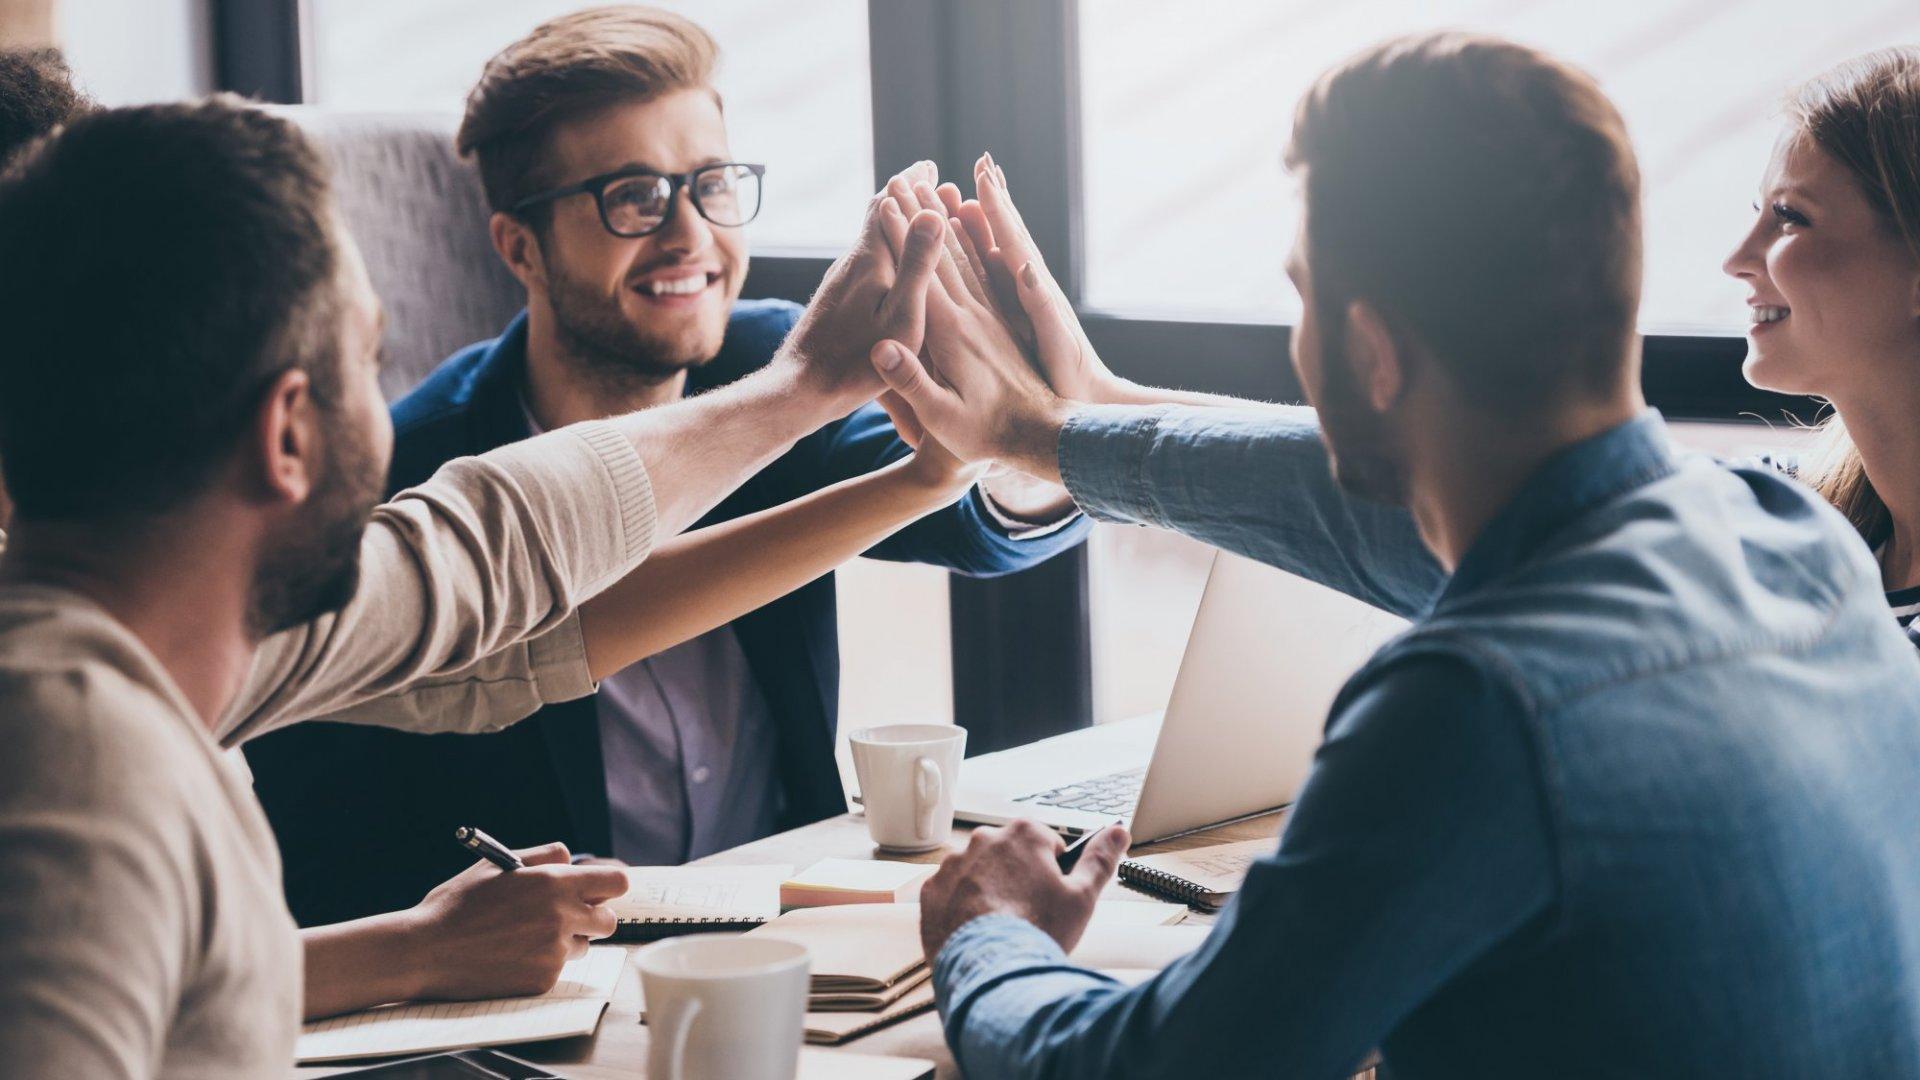 16 Wonderful Gift Ideas for Employee Appreciation Day